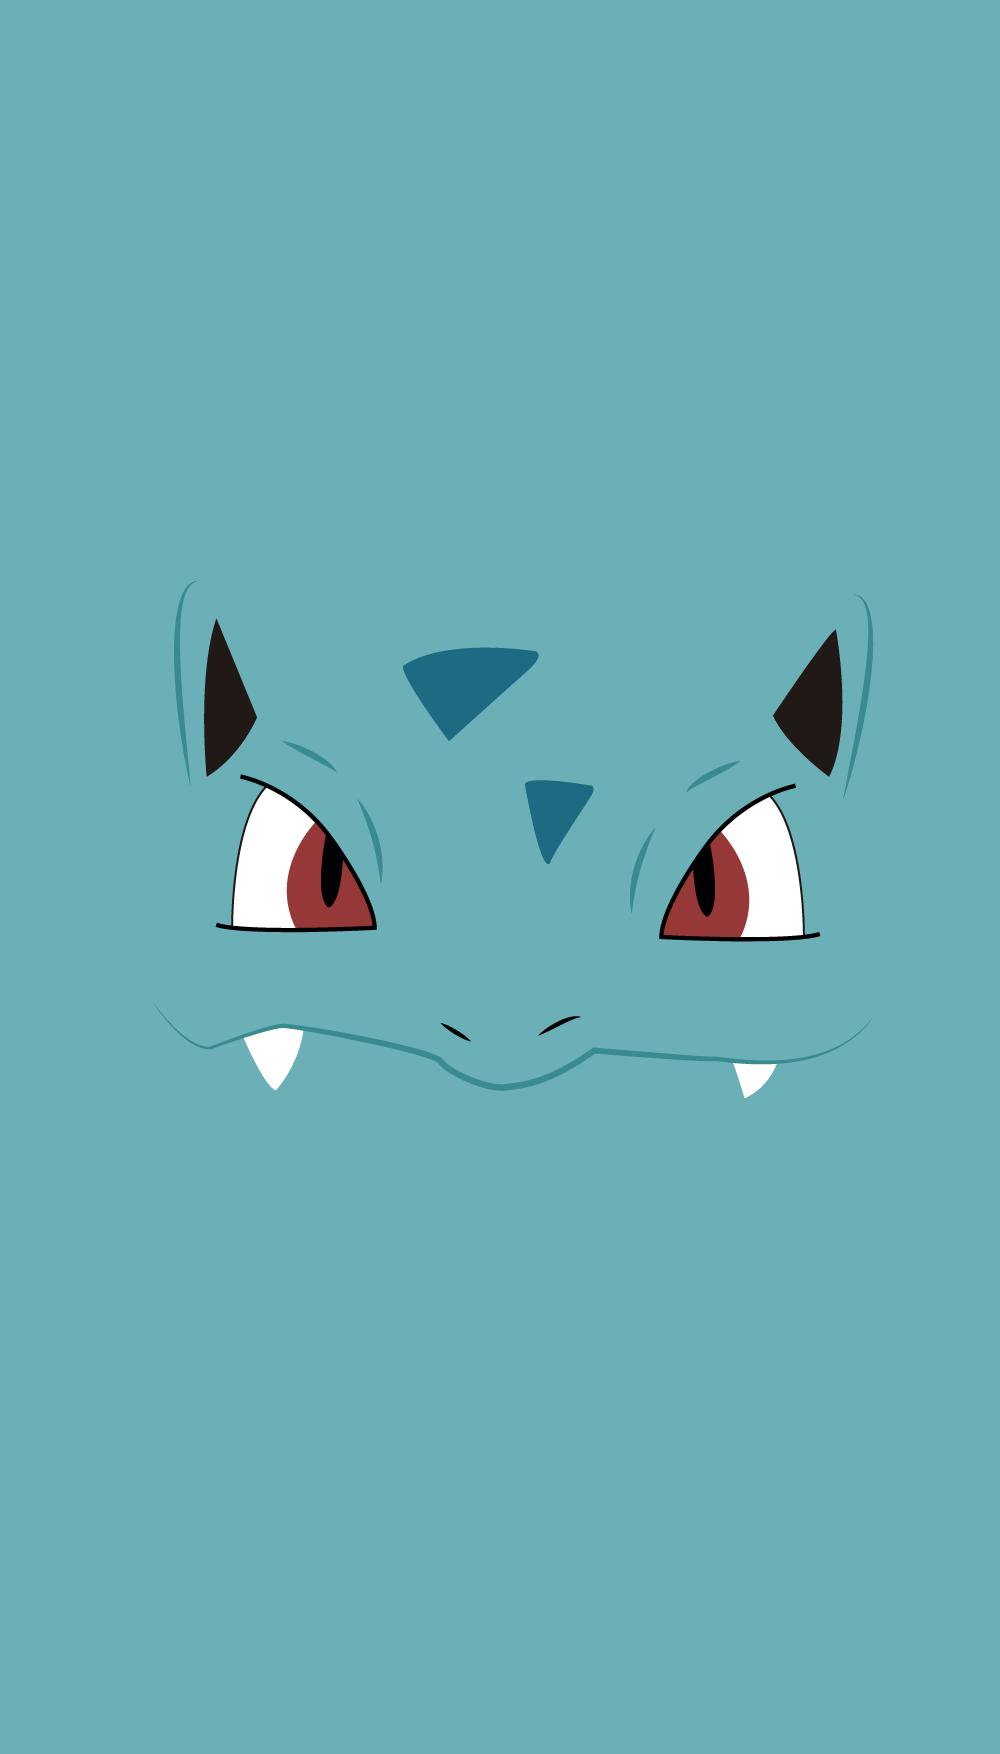 Pokemon Wallpaper Ivysaur ポケモン ポケモン かわいい ポケモンの描き方